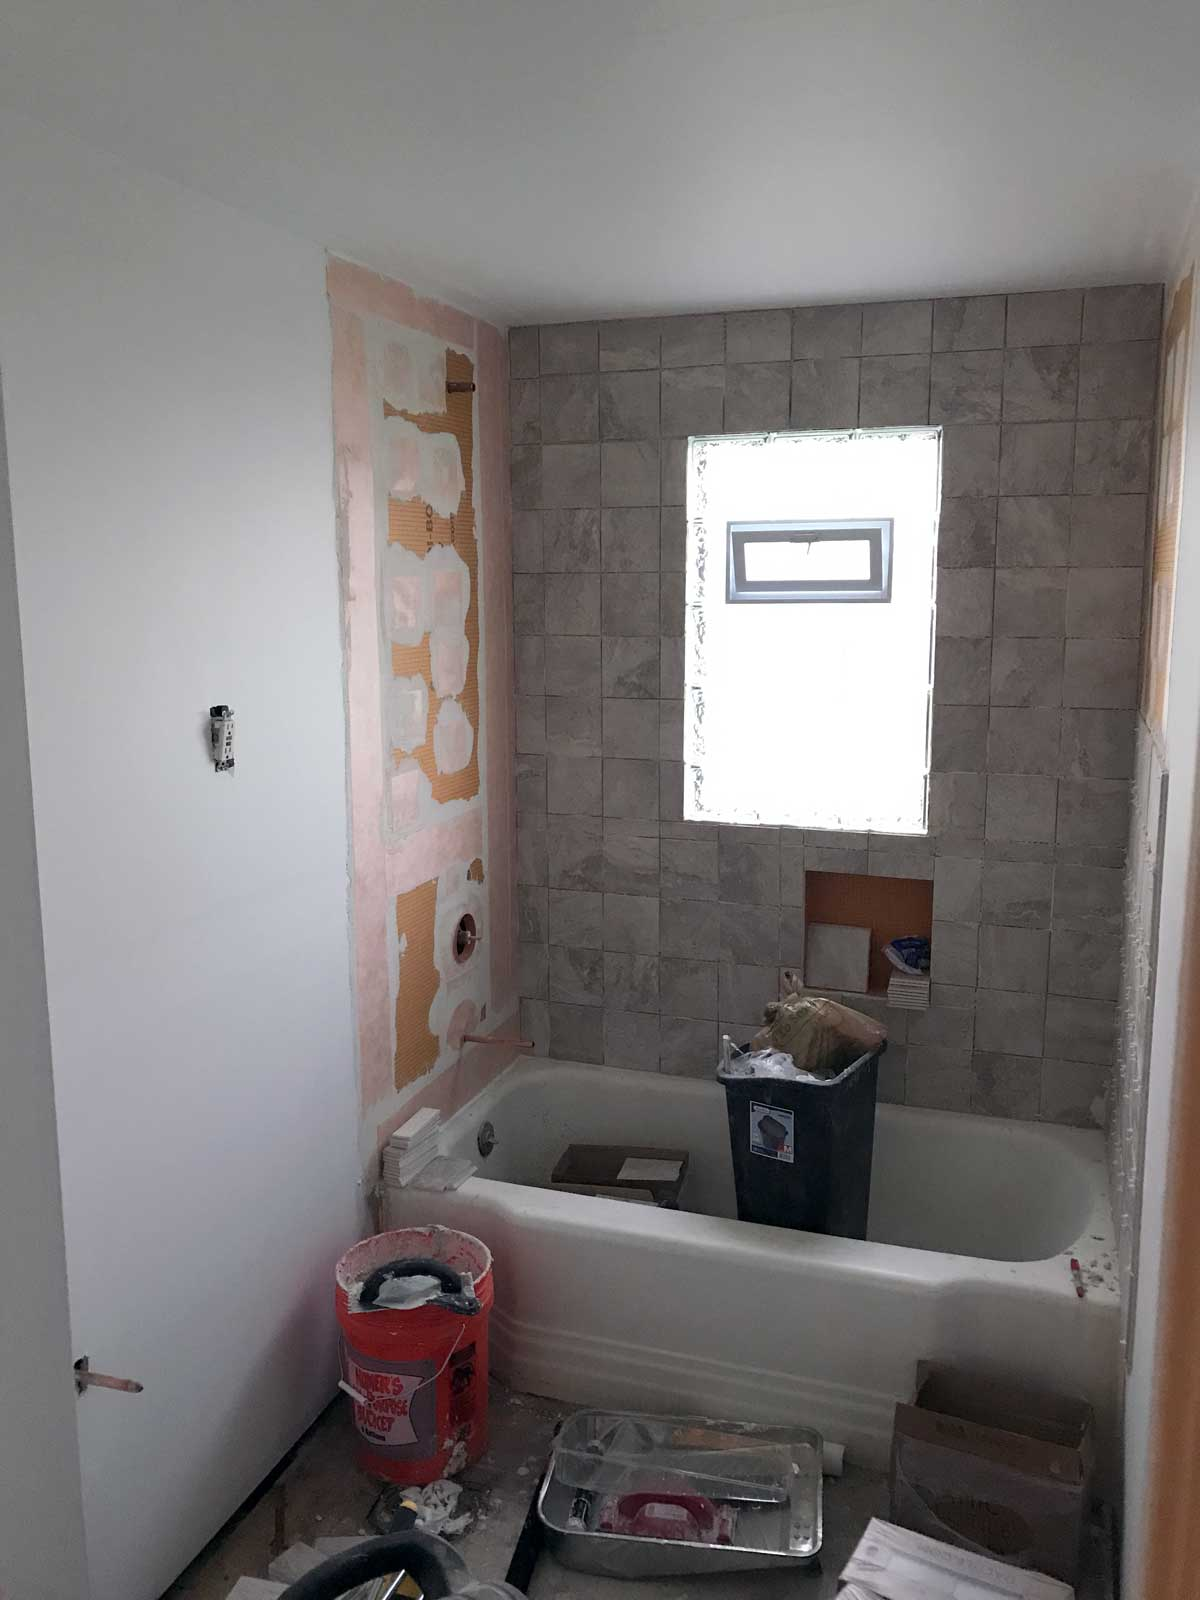 15 Day Bathroom Renovation Tiling Day 01